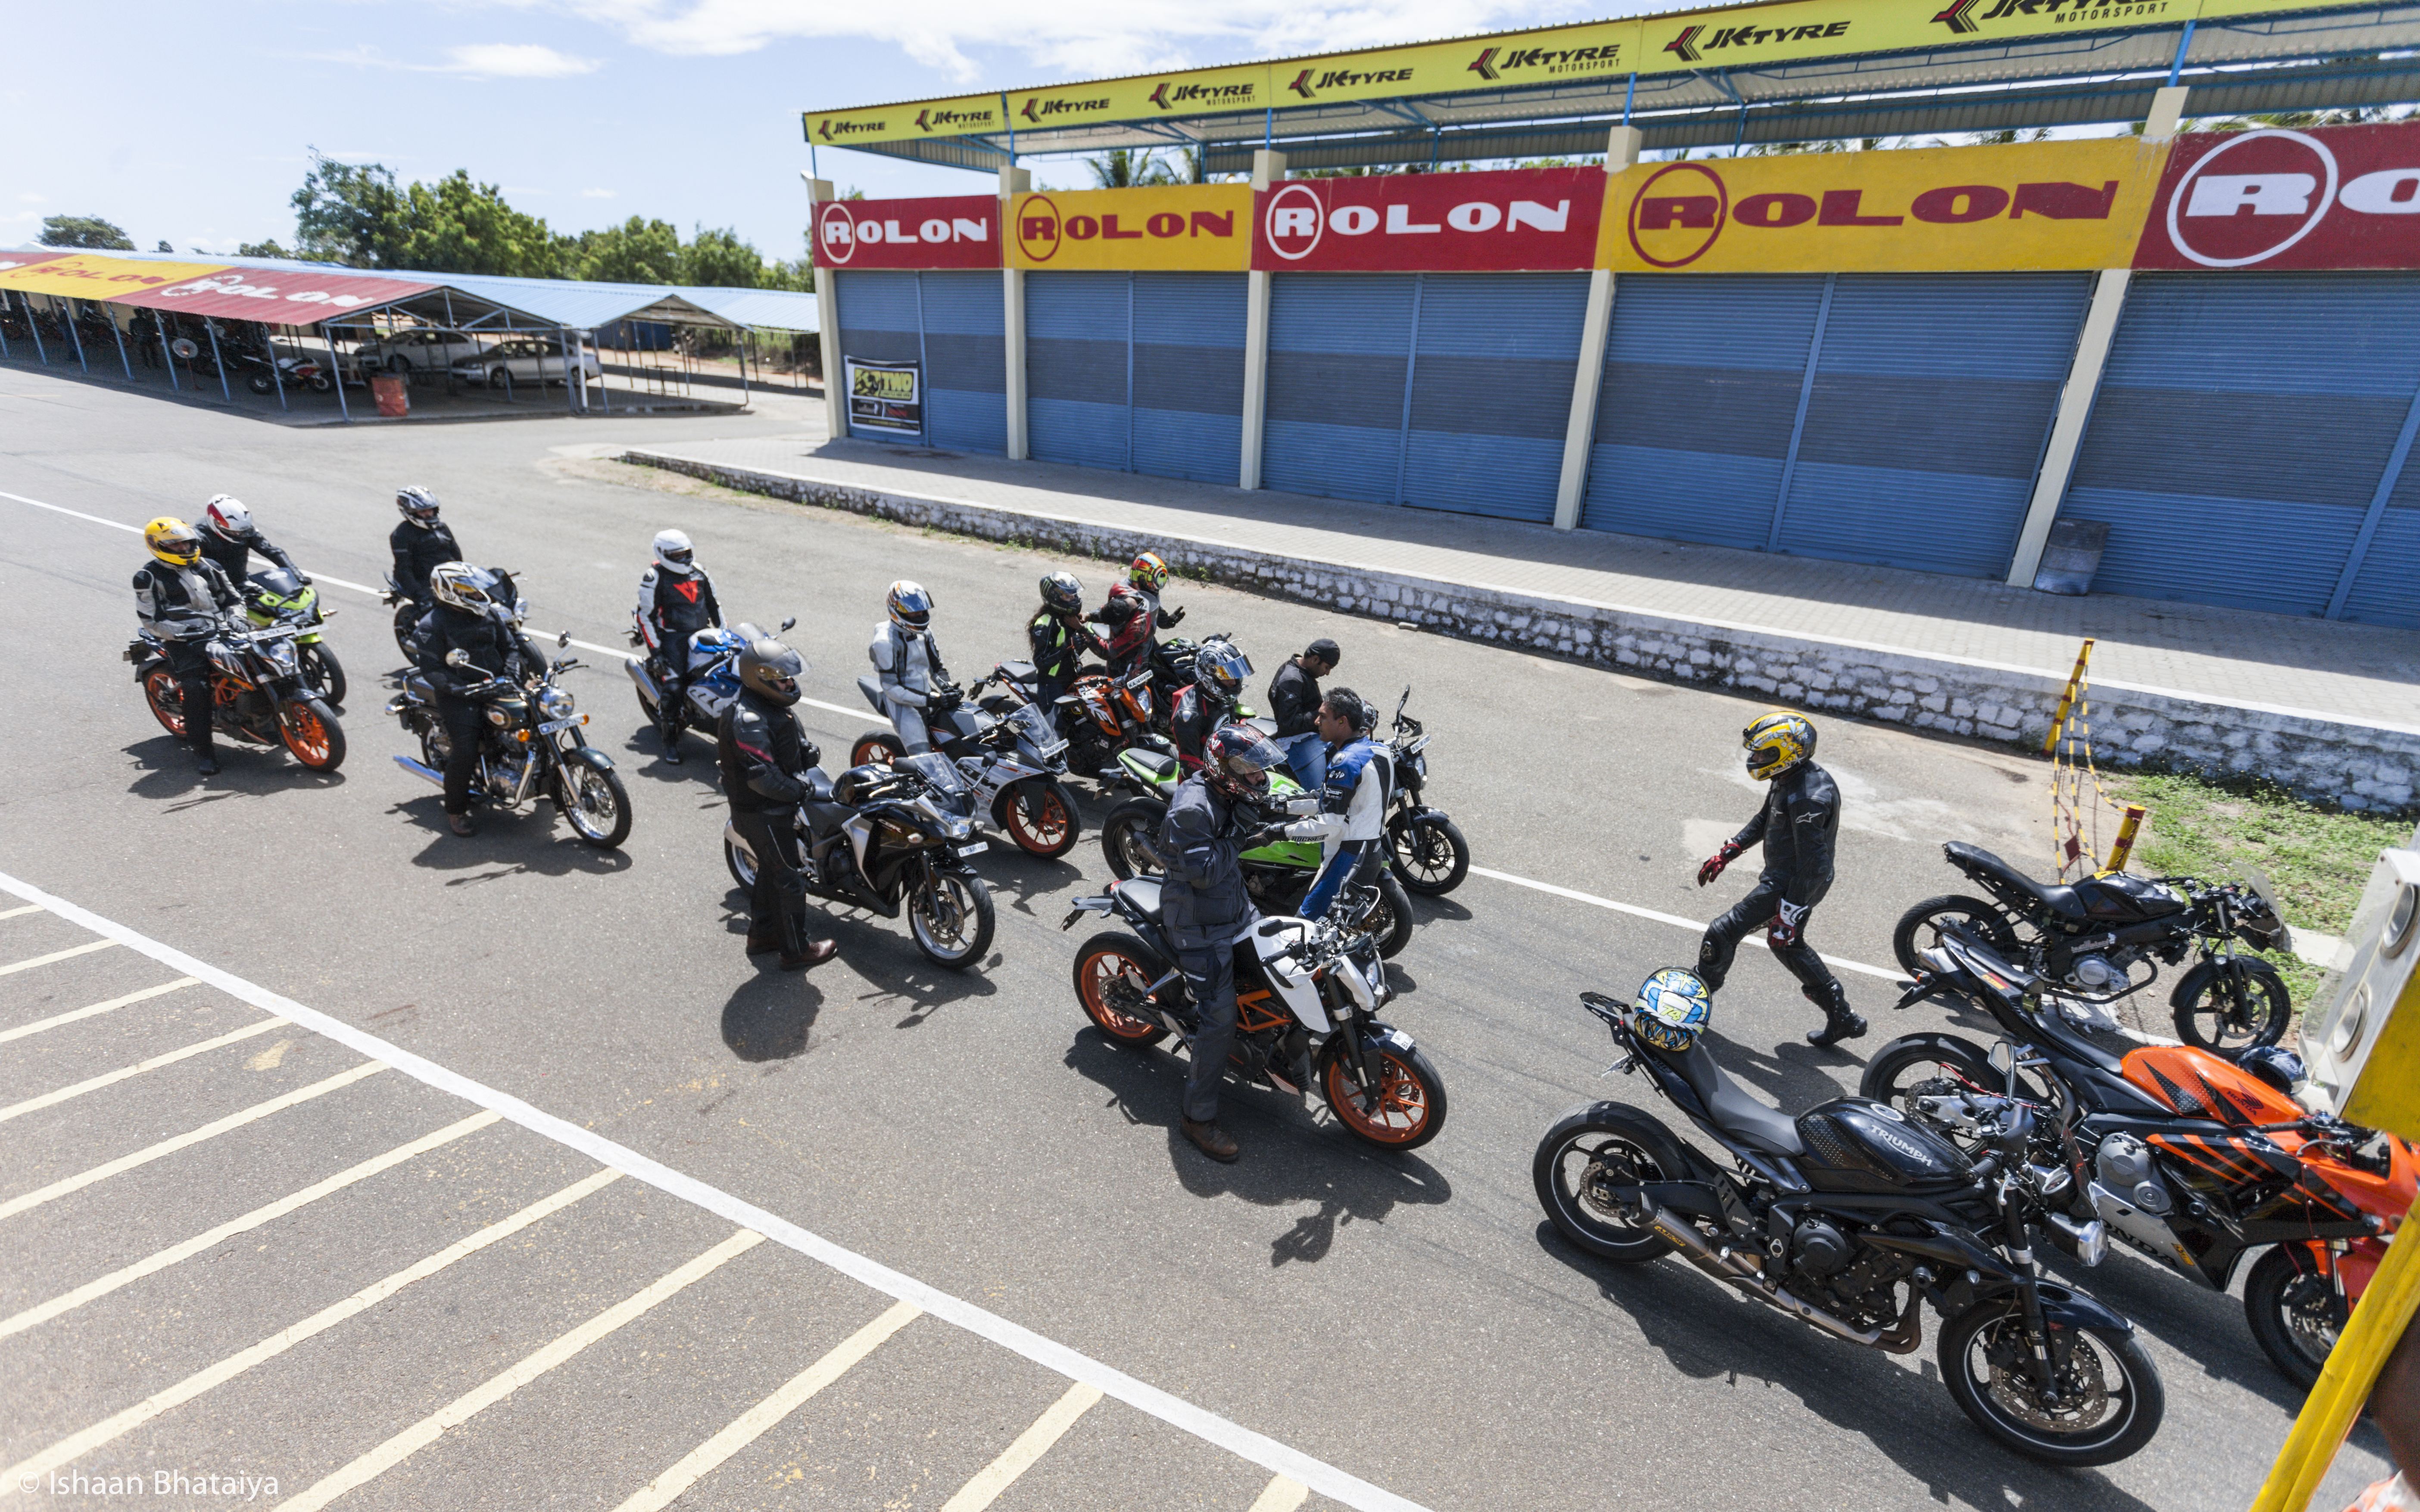 Indimotard - Motorcycle Tours, Riding School, Garage and